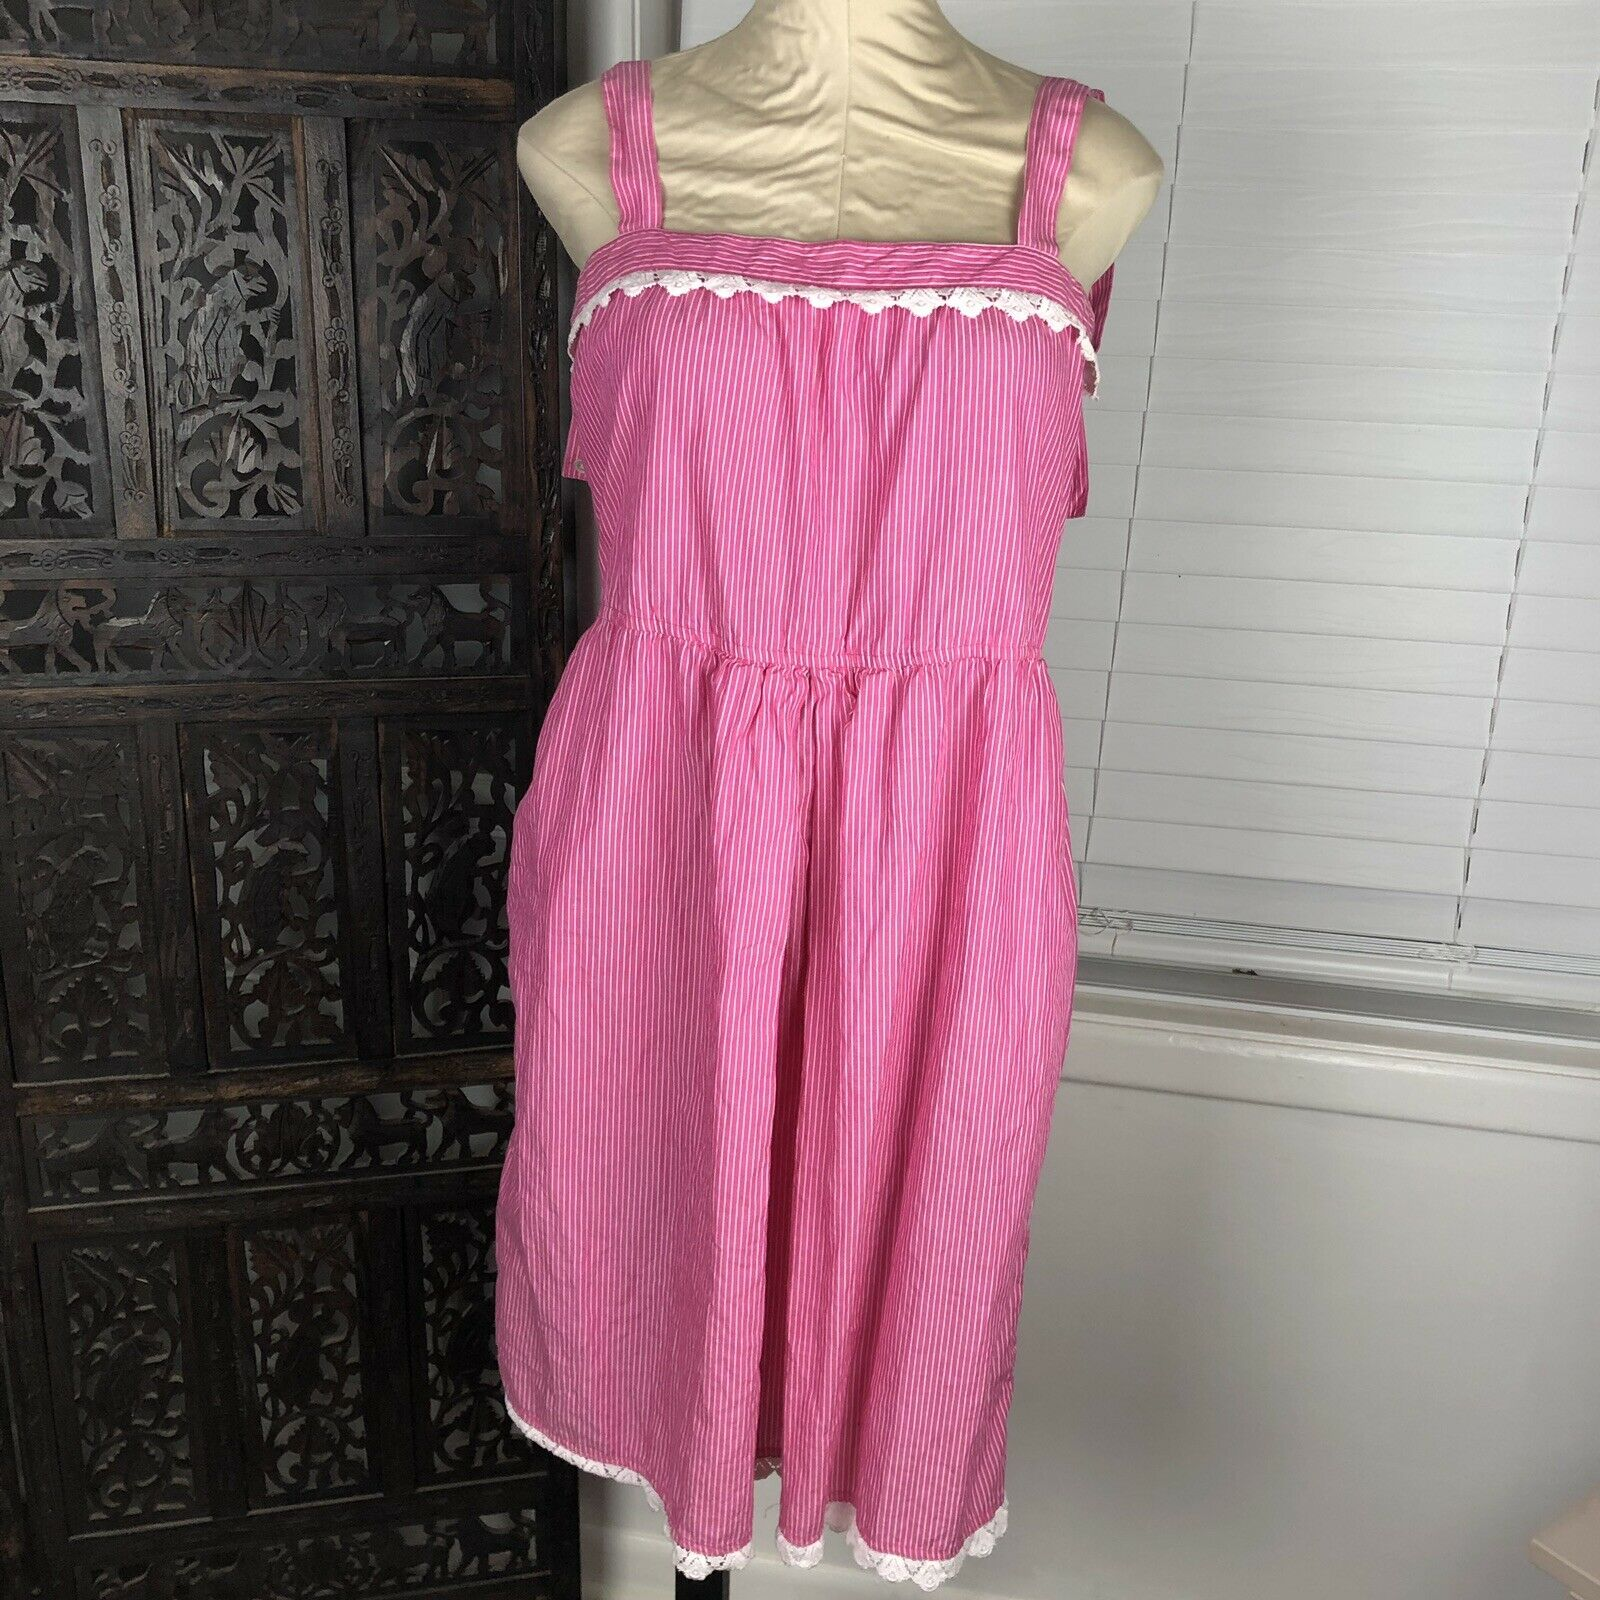 Vintage Diane Von Furstenberg Dress 8 Pink Stripe Lace Trim Keyhole Cotton Korea